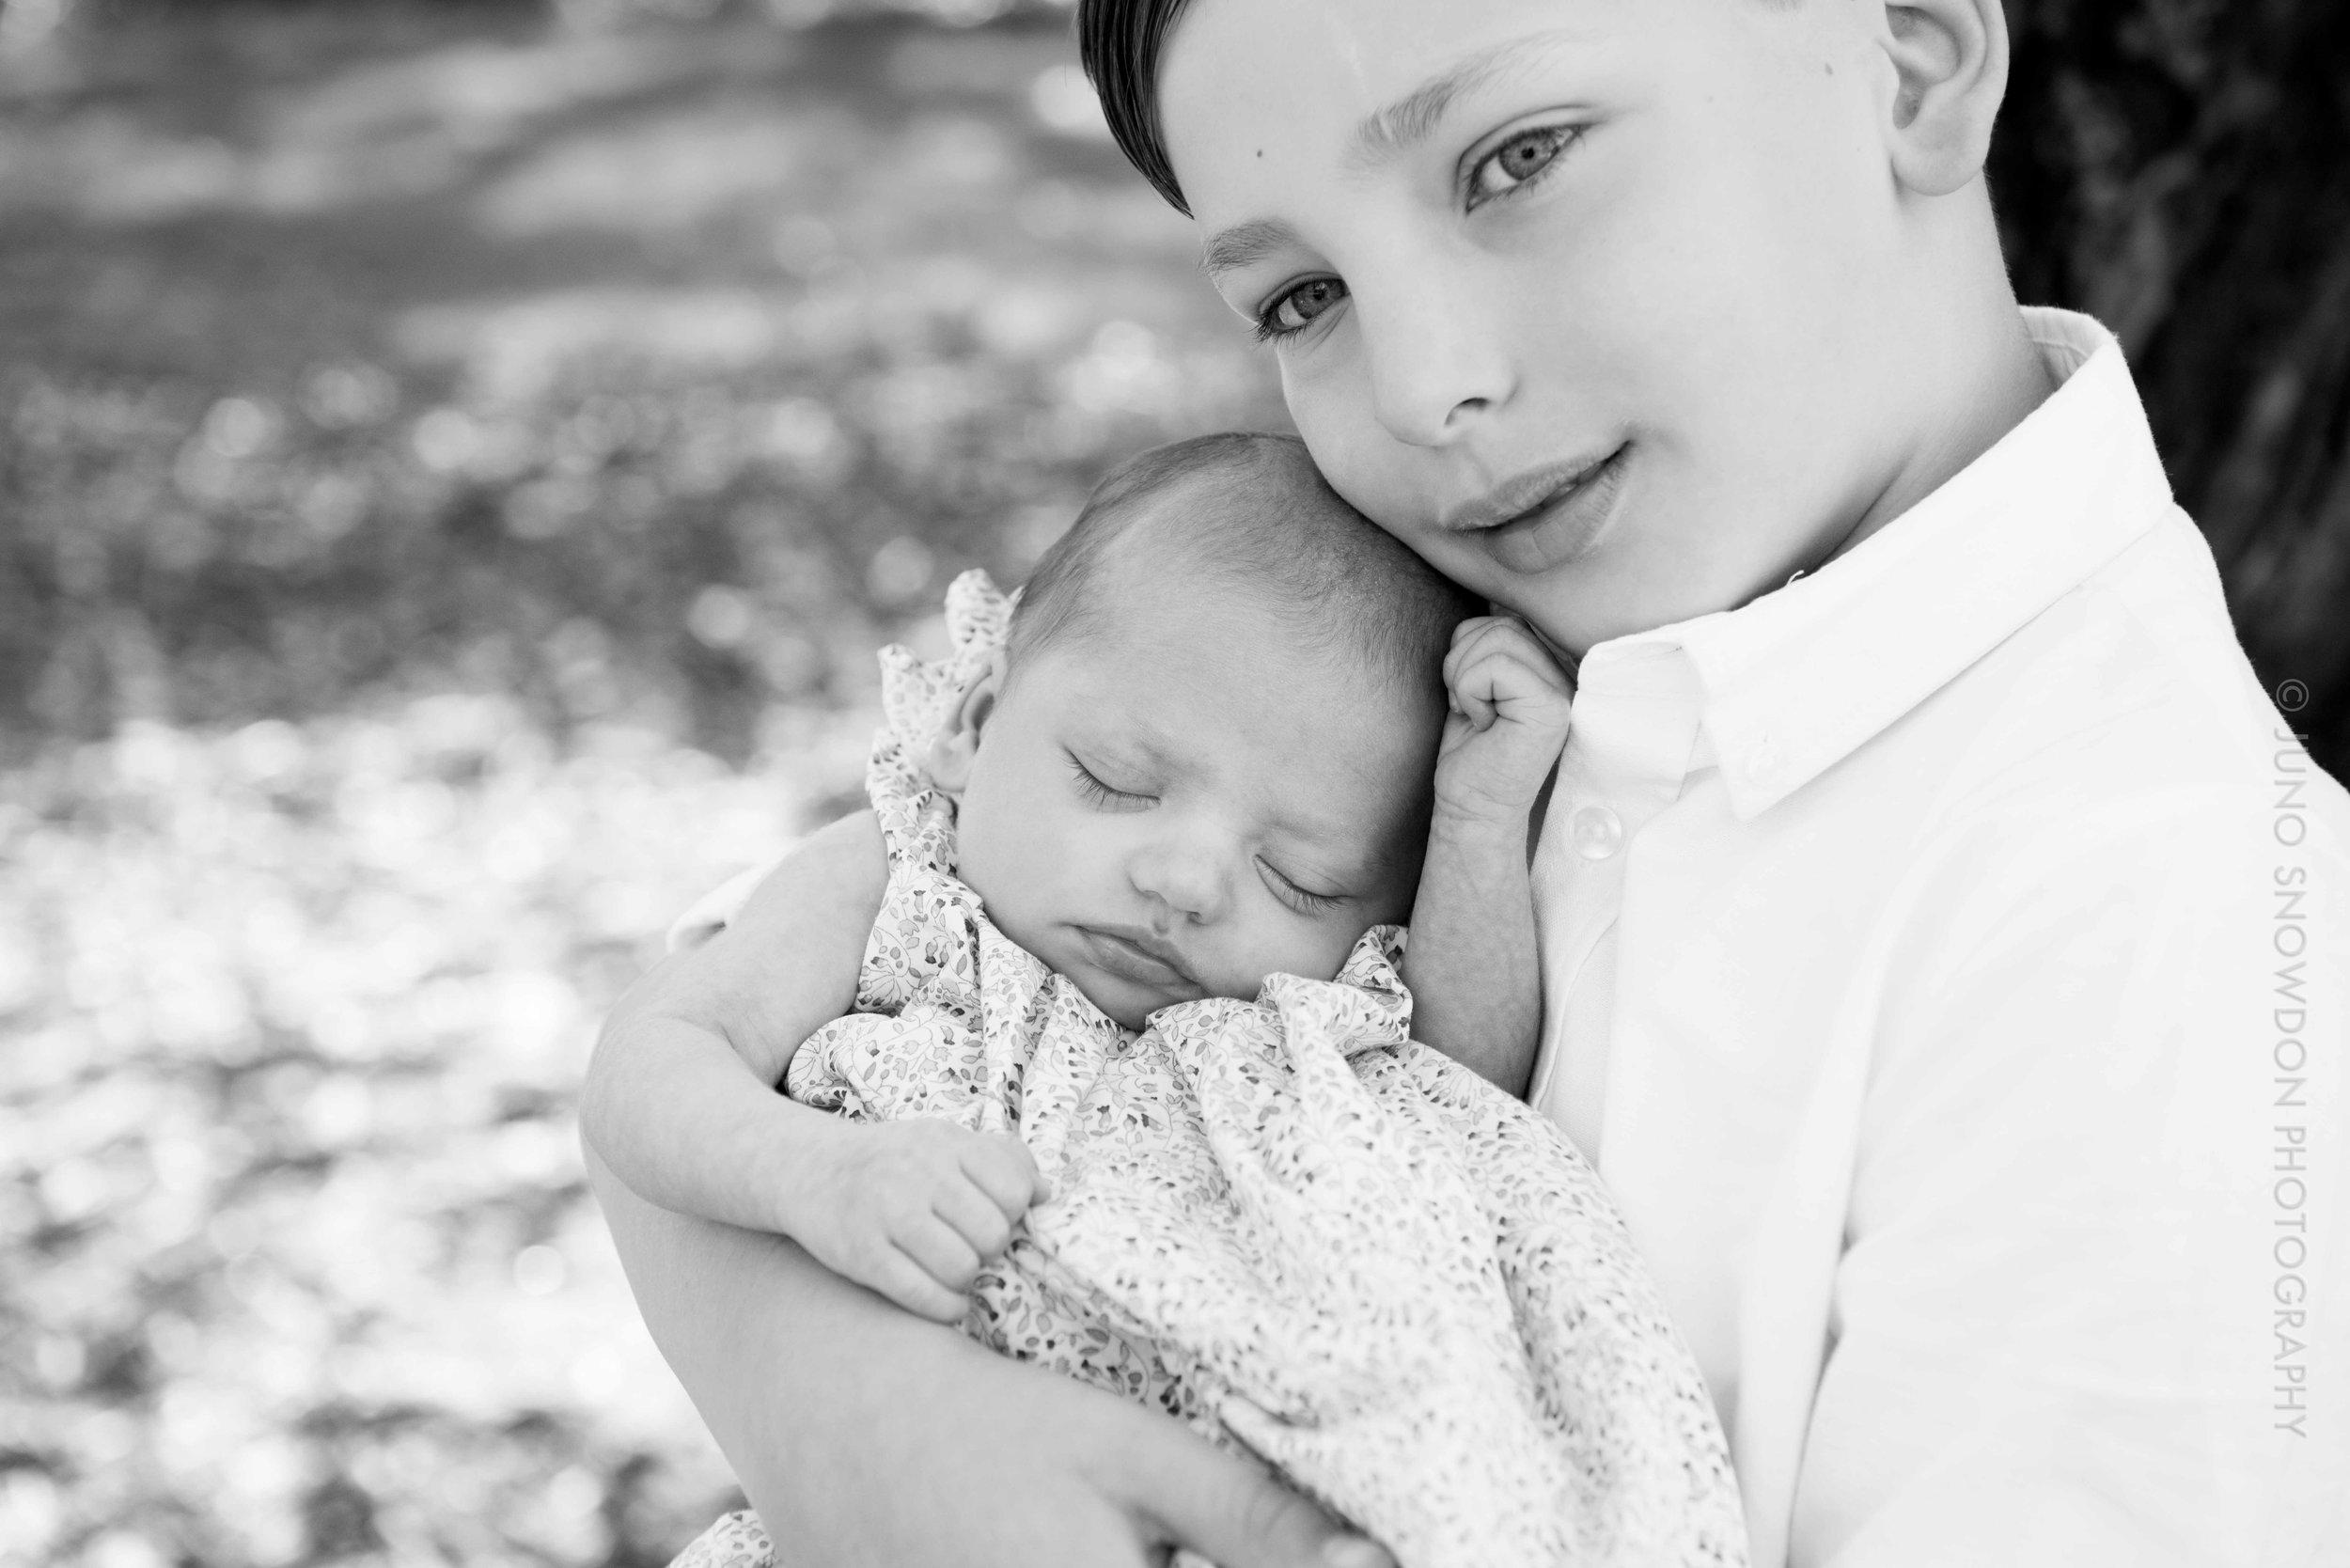 juno-snowdon-photography-newborn-5935.jpg